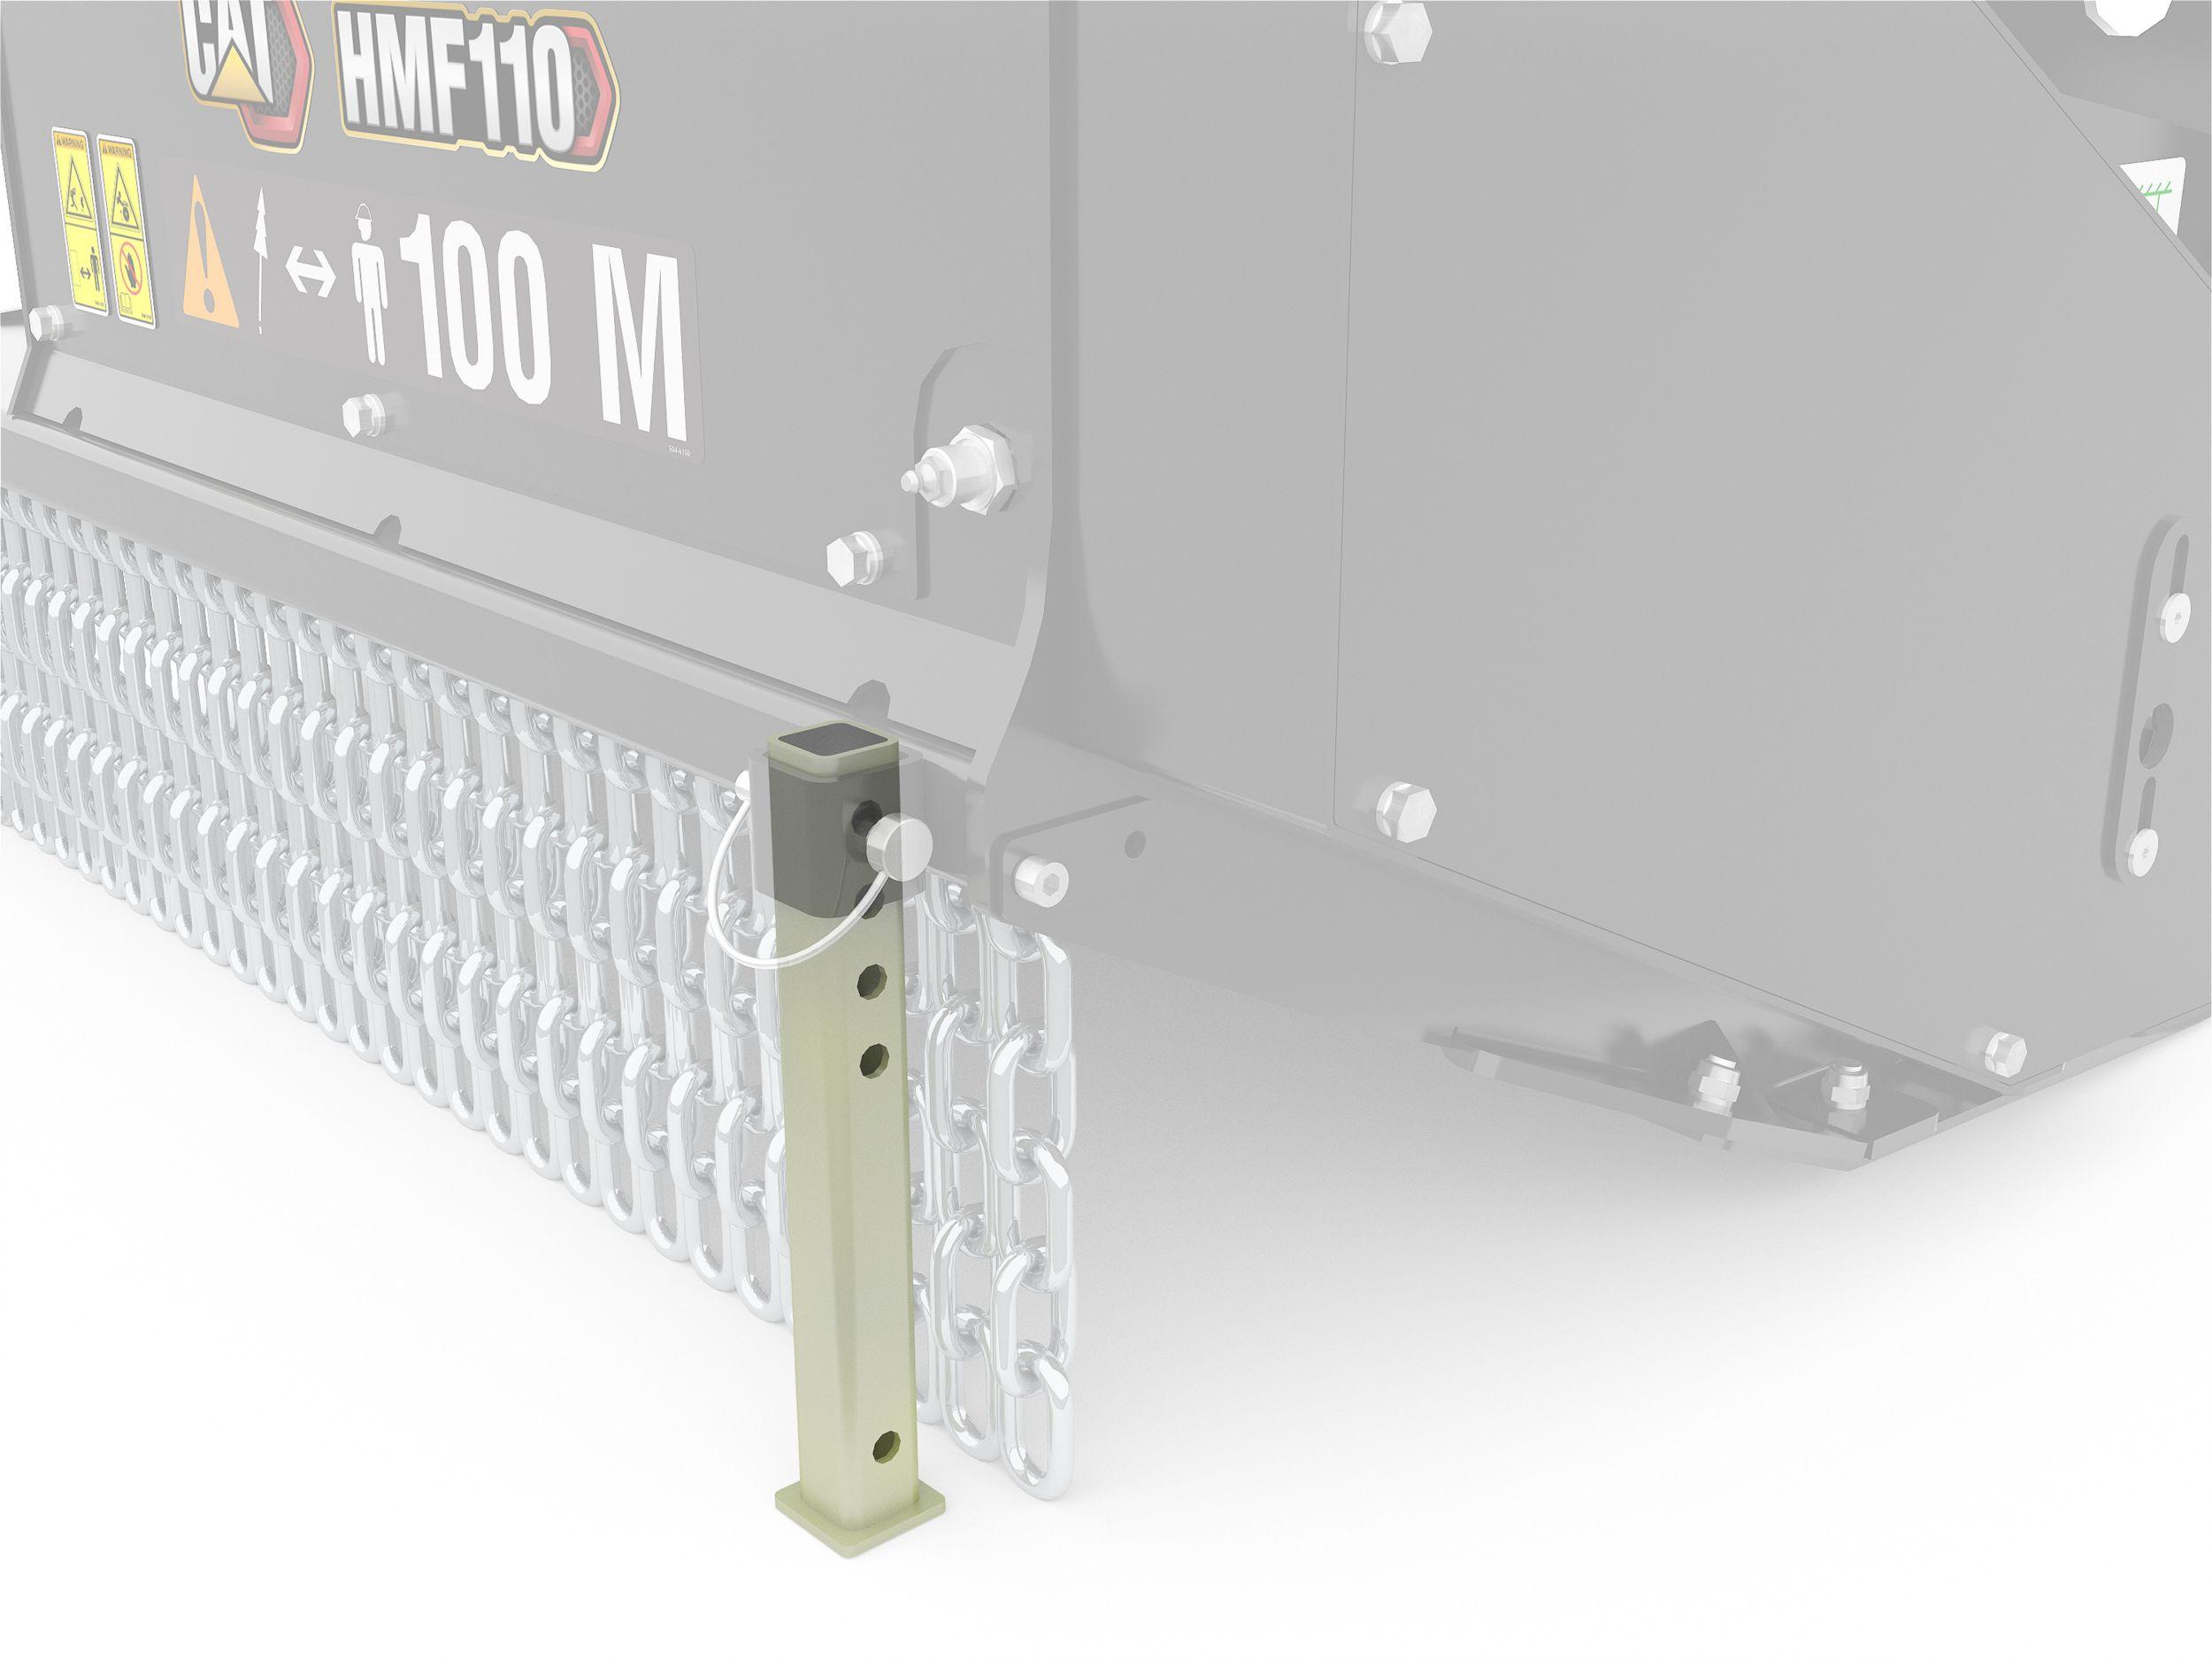 Cat   HMF110 Flail Mower   Caterpillar